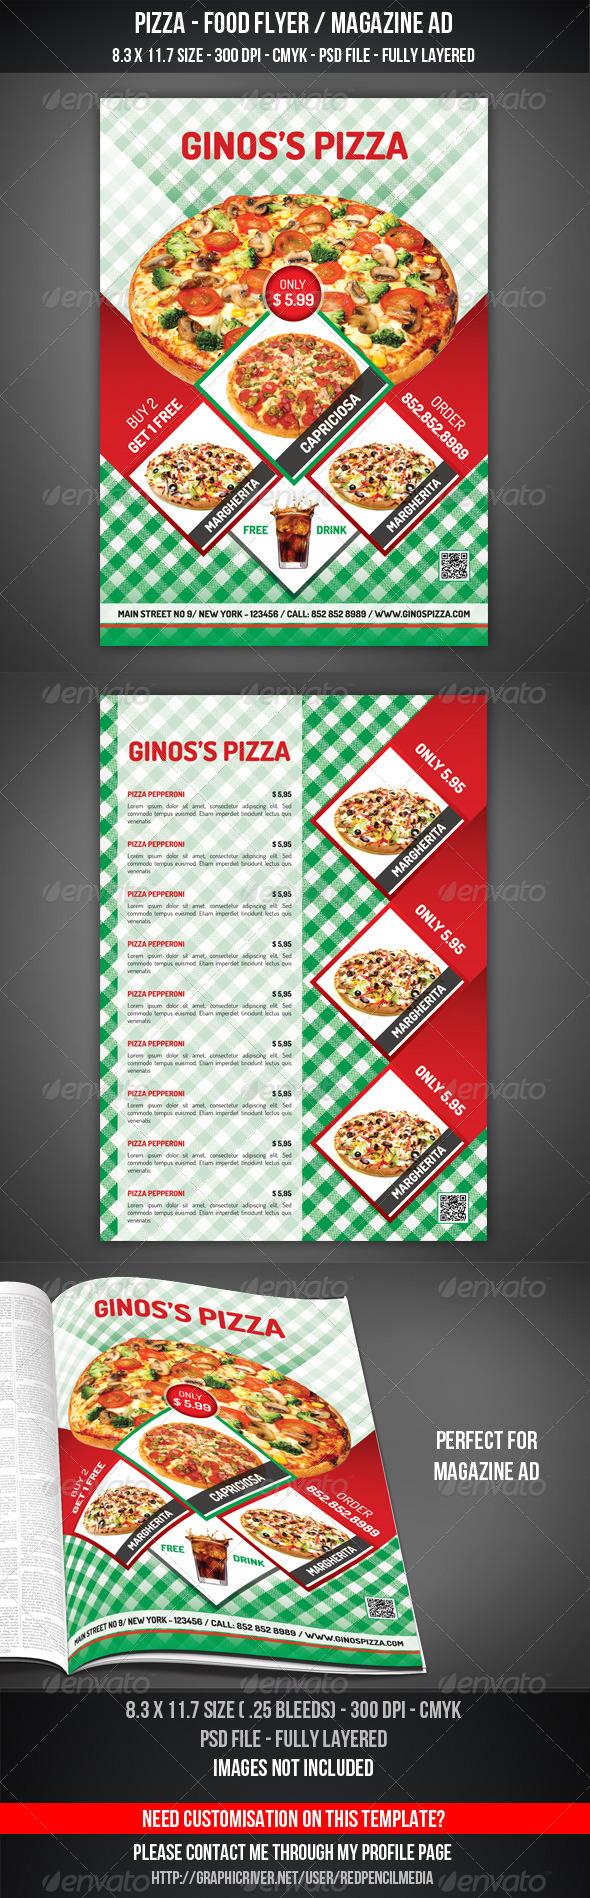 Pizza - Food Flyer / Magazine AD - Flyers Print Templates